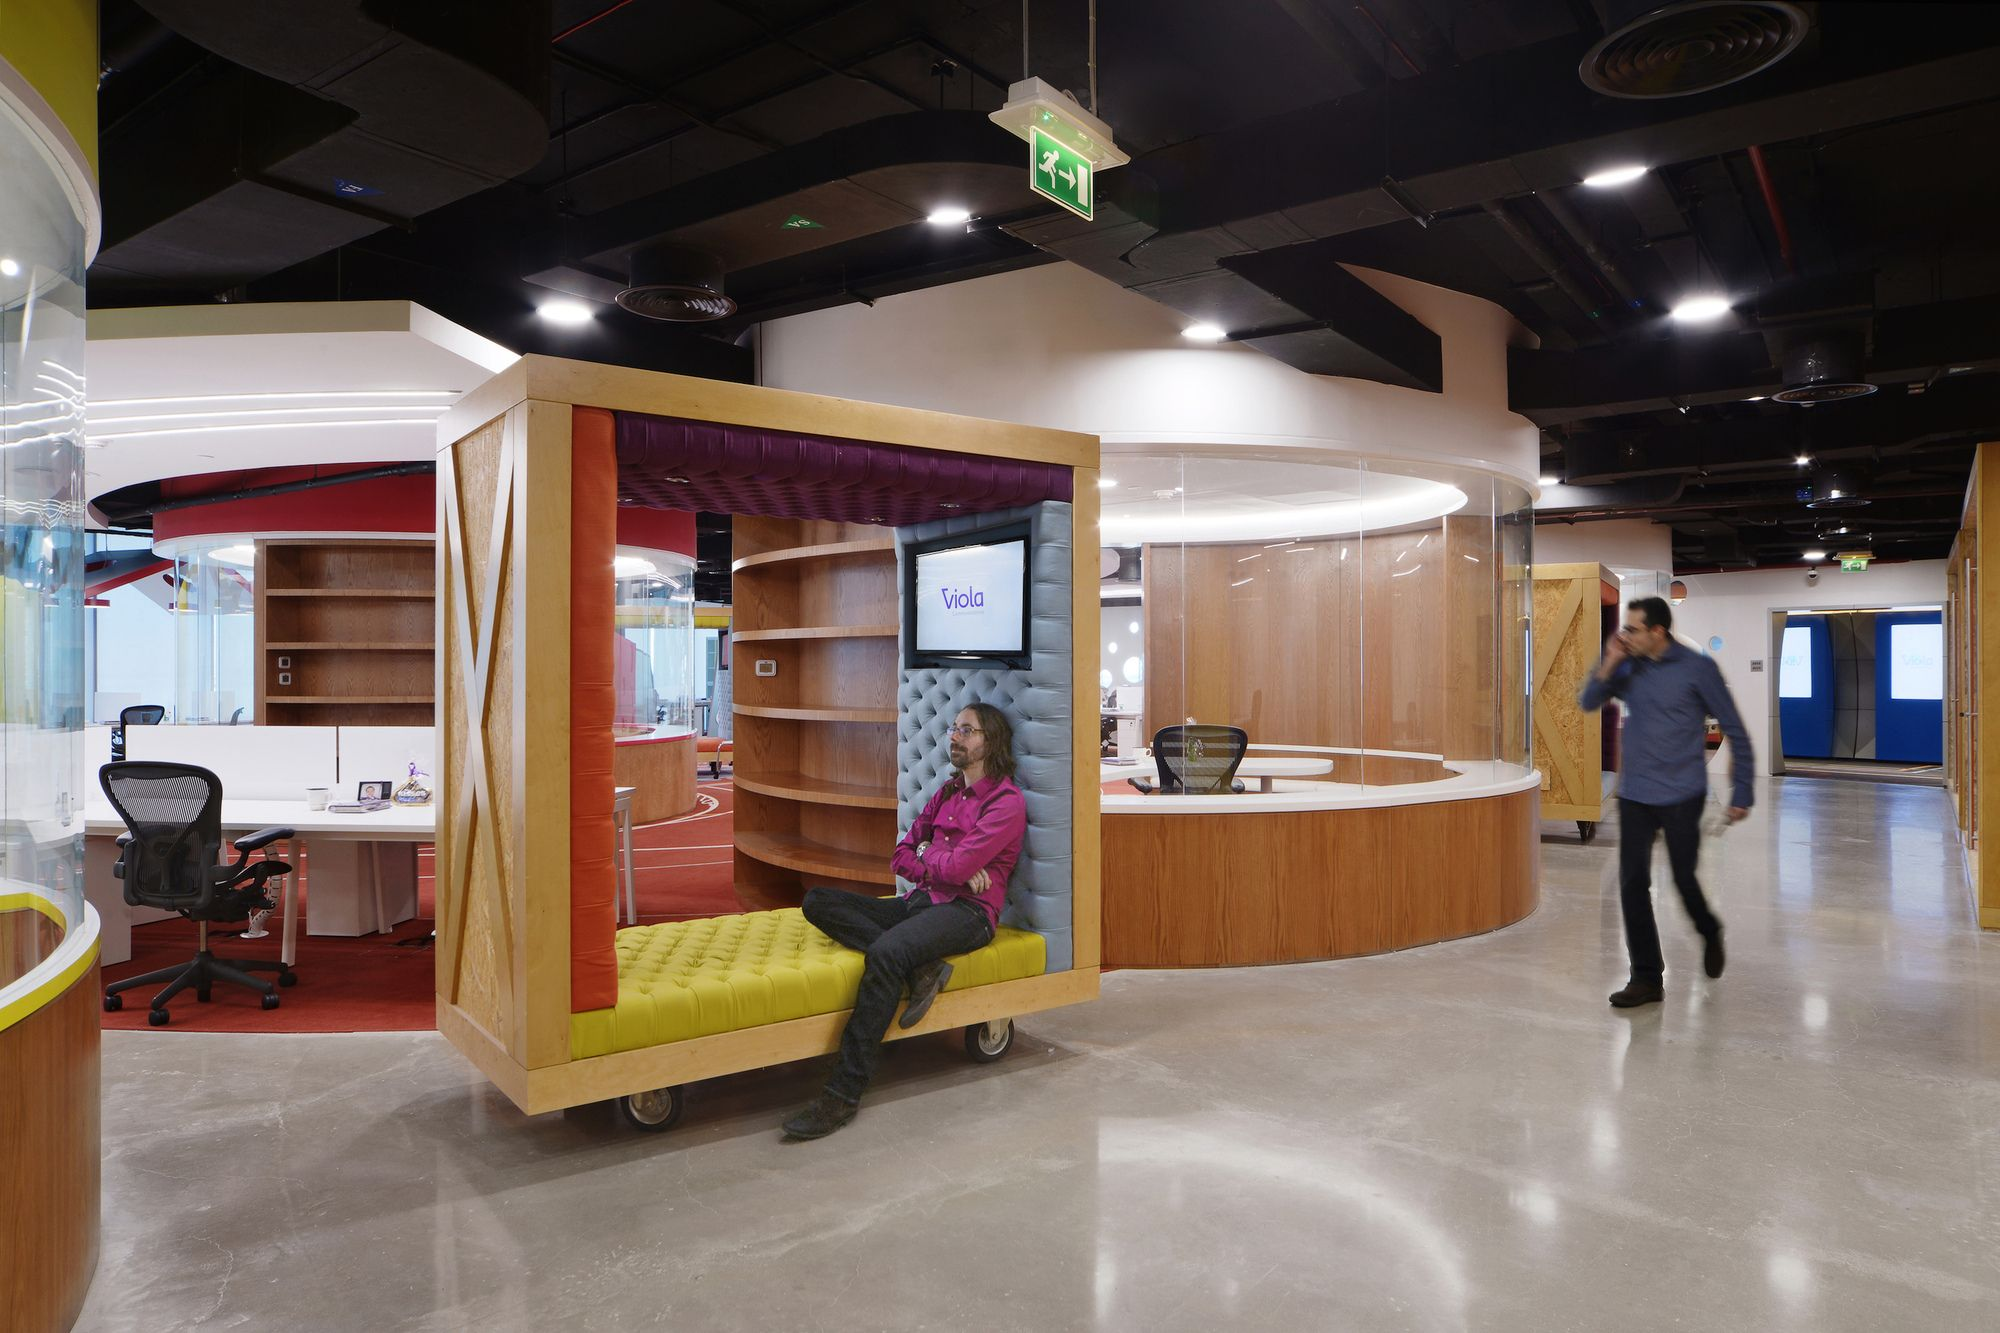 innovative office designs. Viola Communications Office / M+N Architecture Innovative Designs N